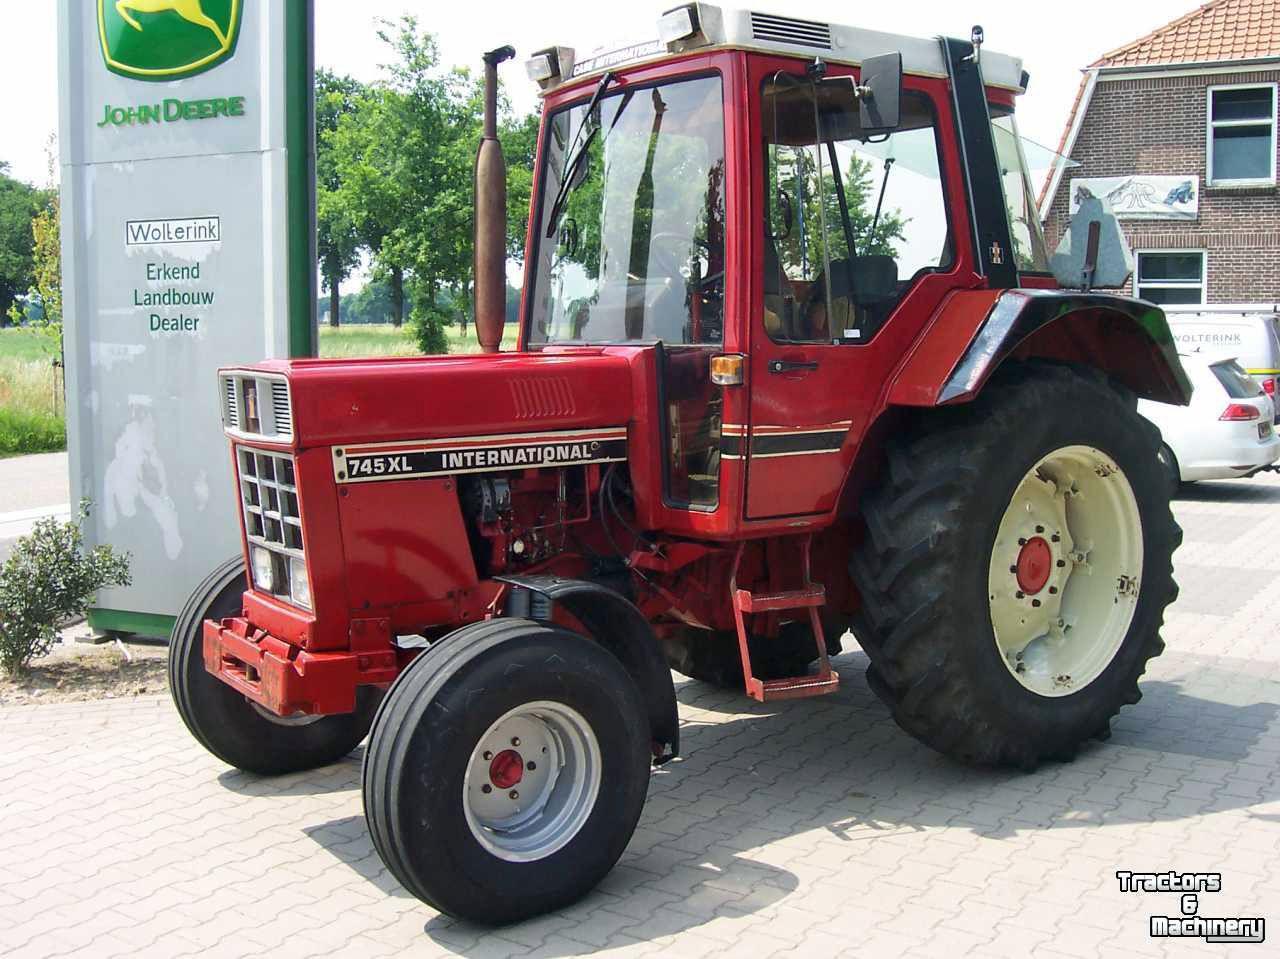 International 745xl Landbouw